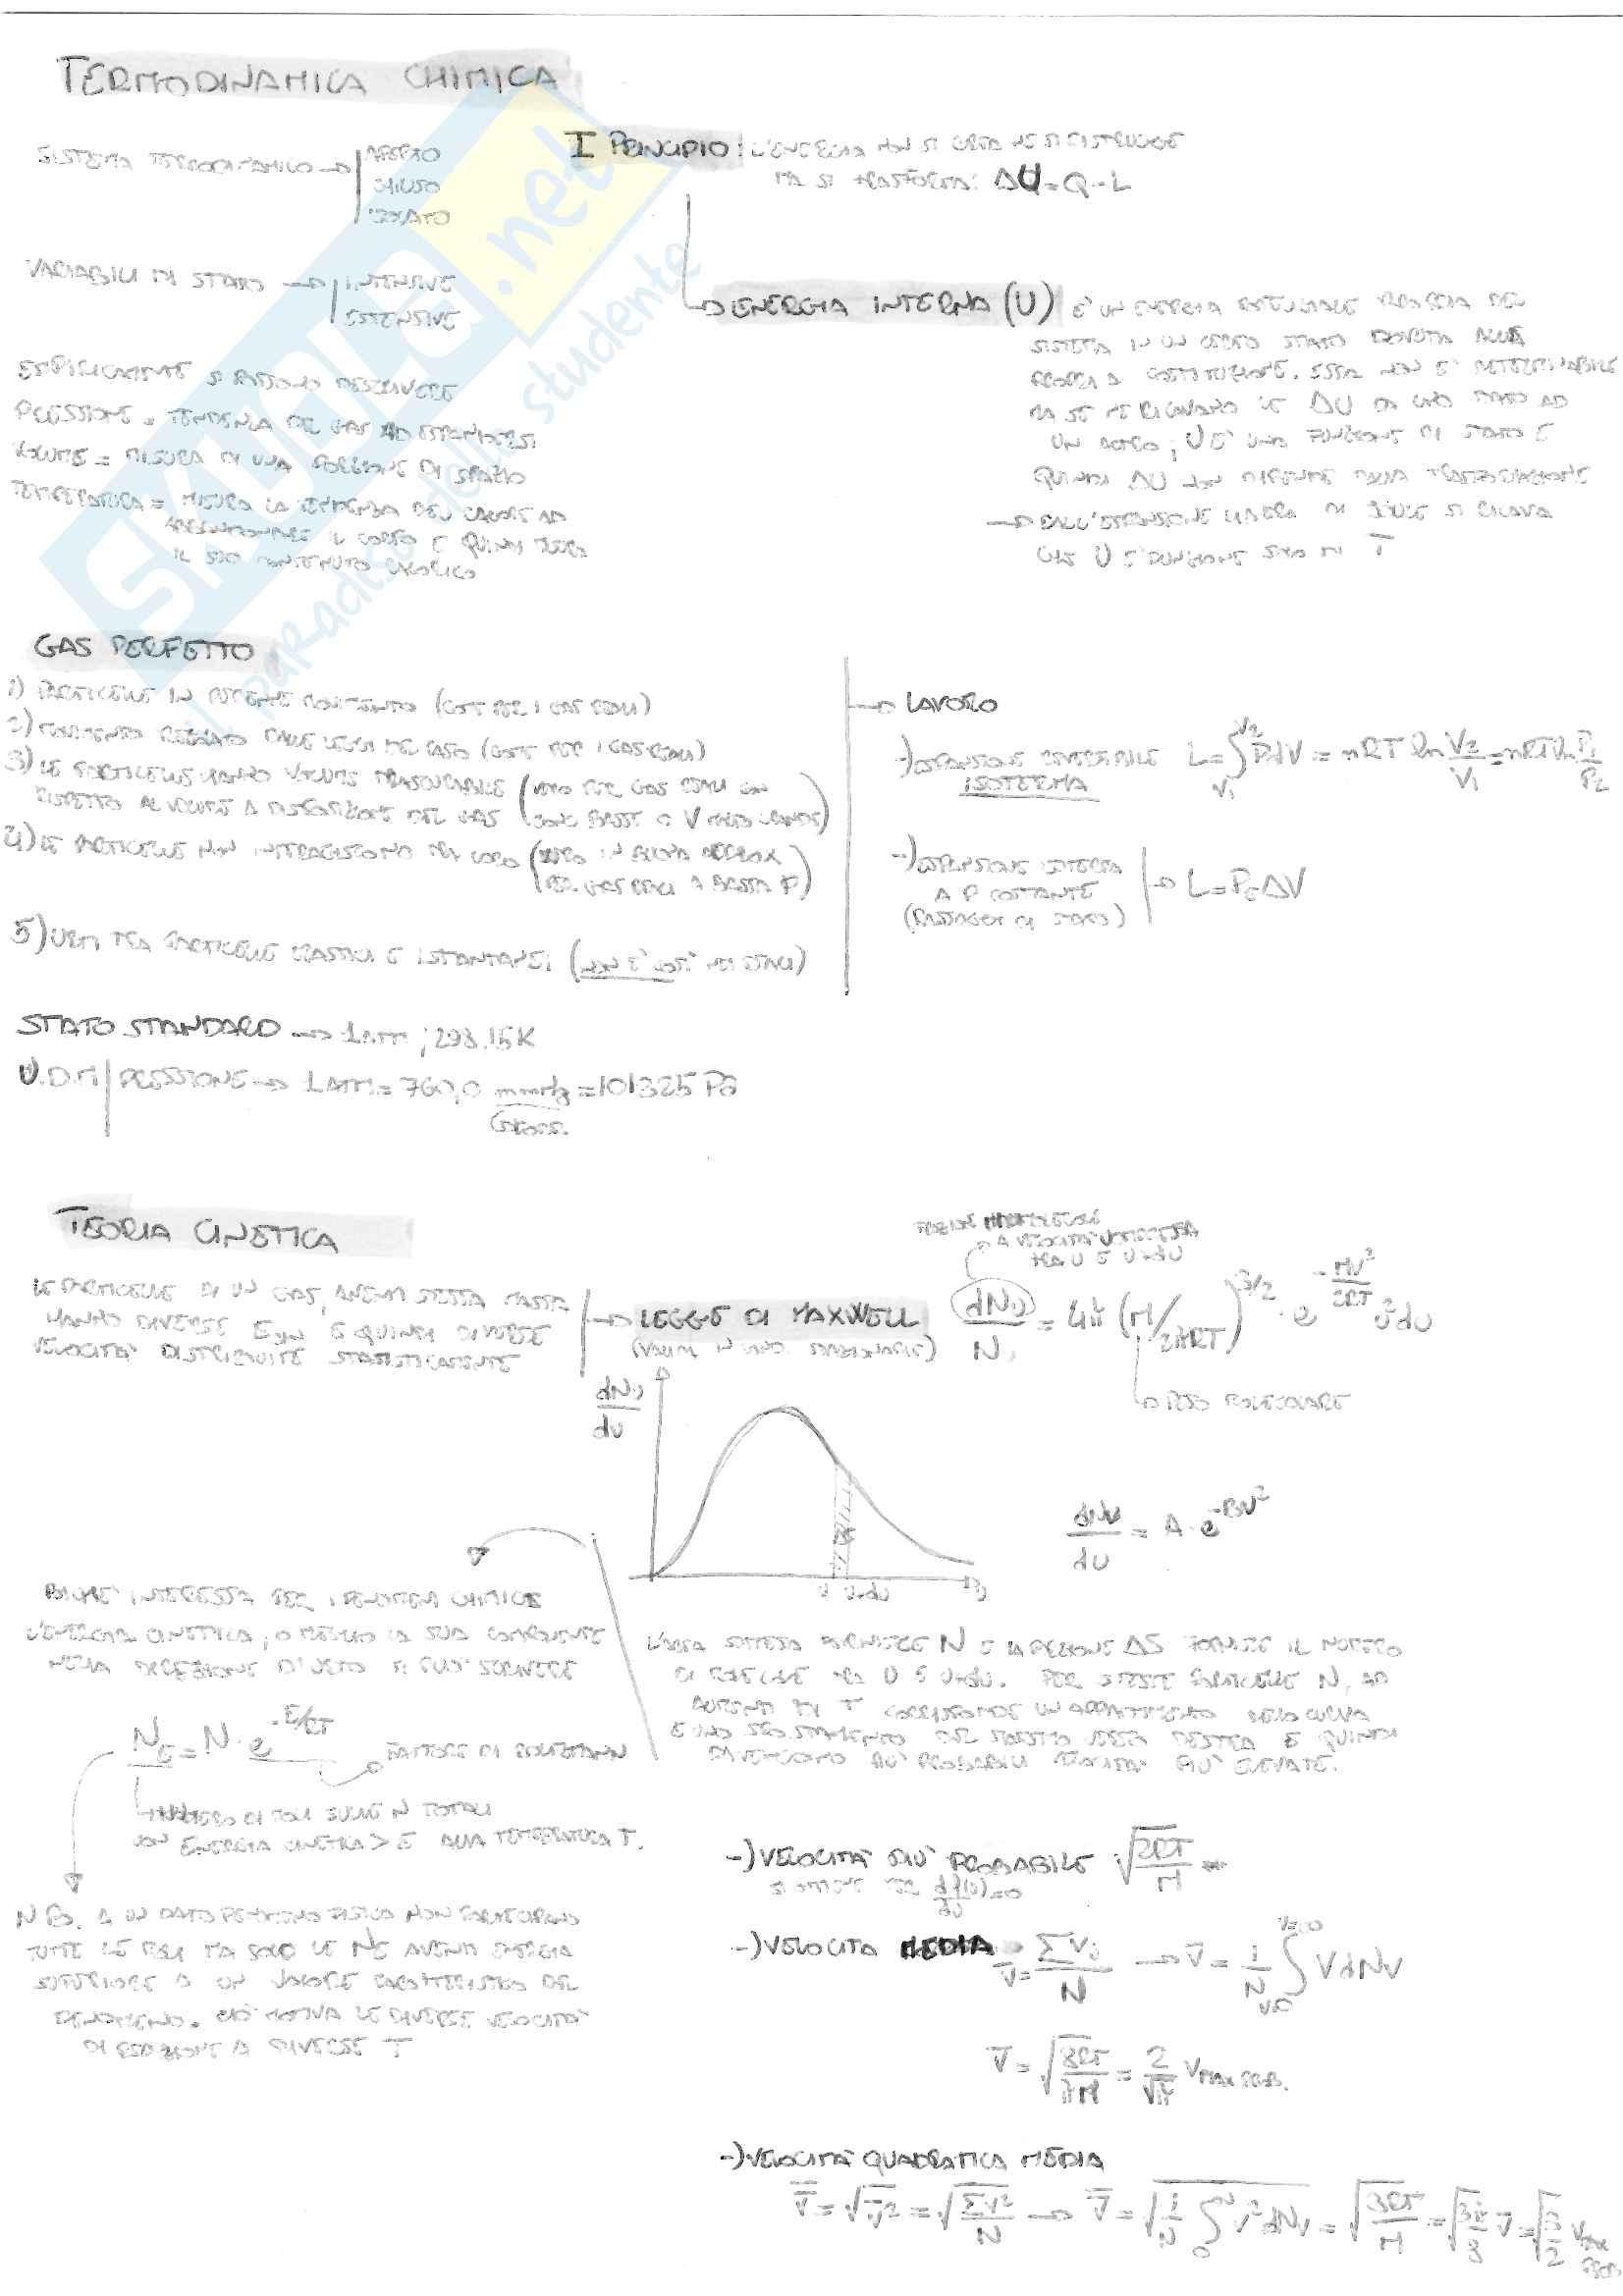 Chimica 02 Termodinamica Chimica